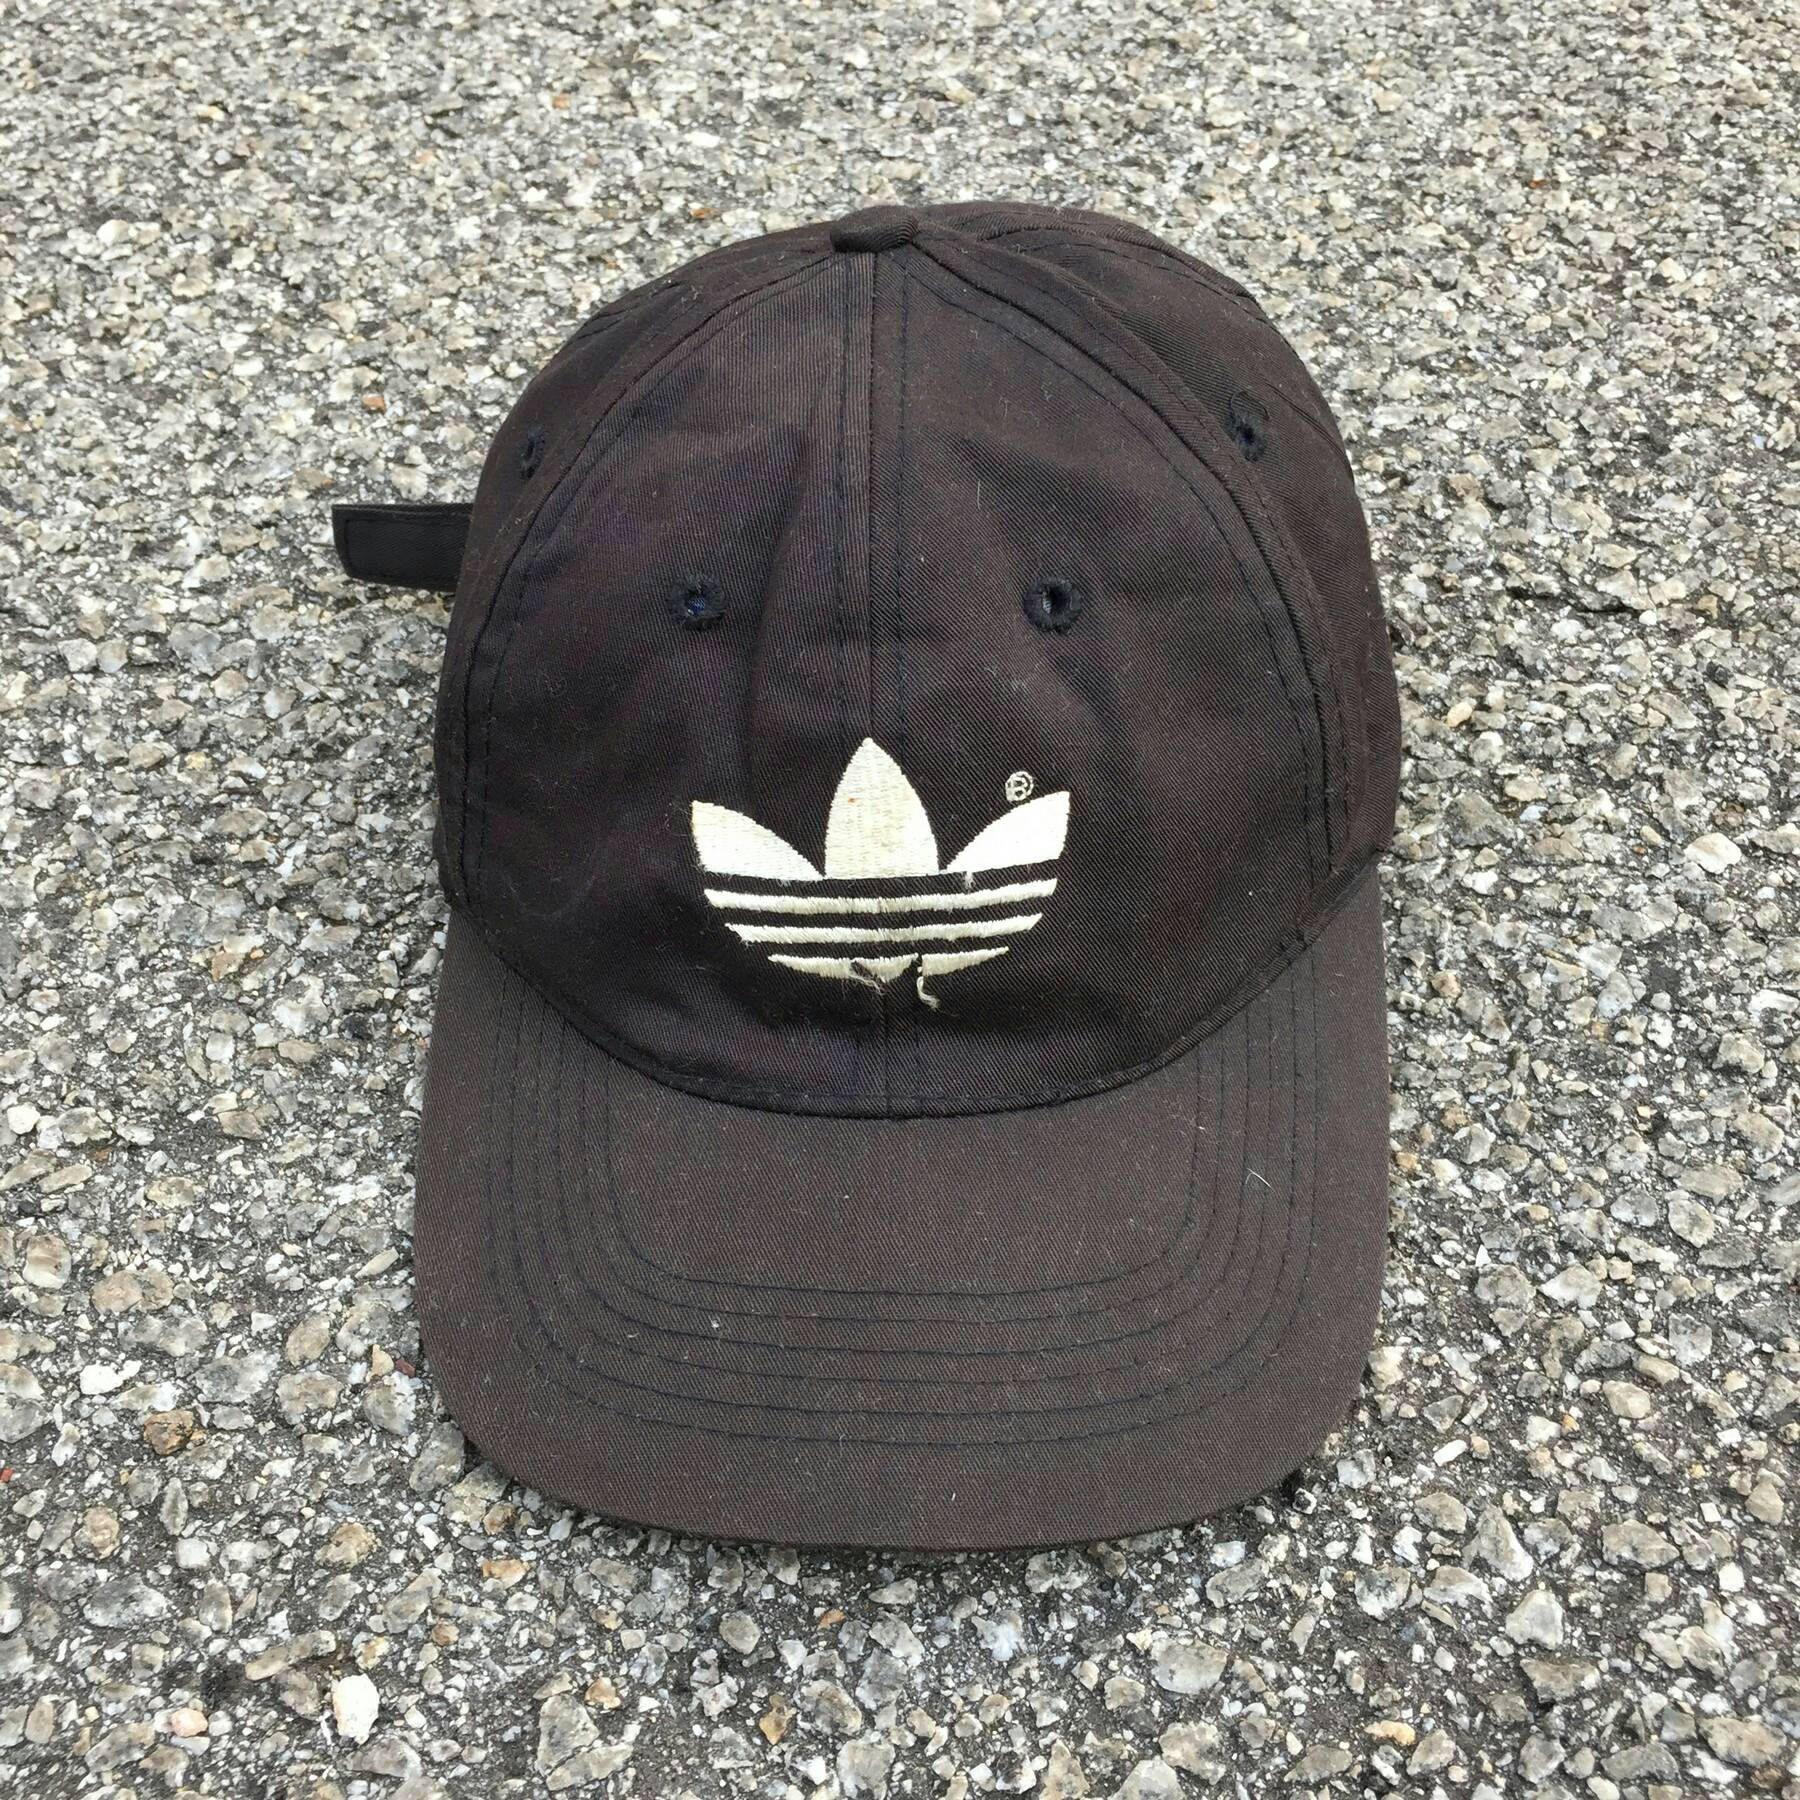 6ac8a41944361 ADIDAS TREFOIL Cap Vintage 90's Adidas Sportswear Cap Snapback ...